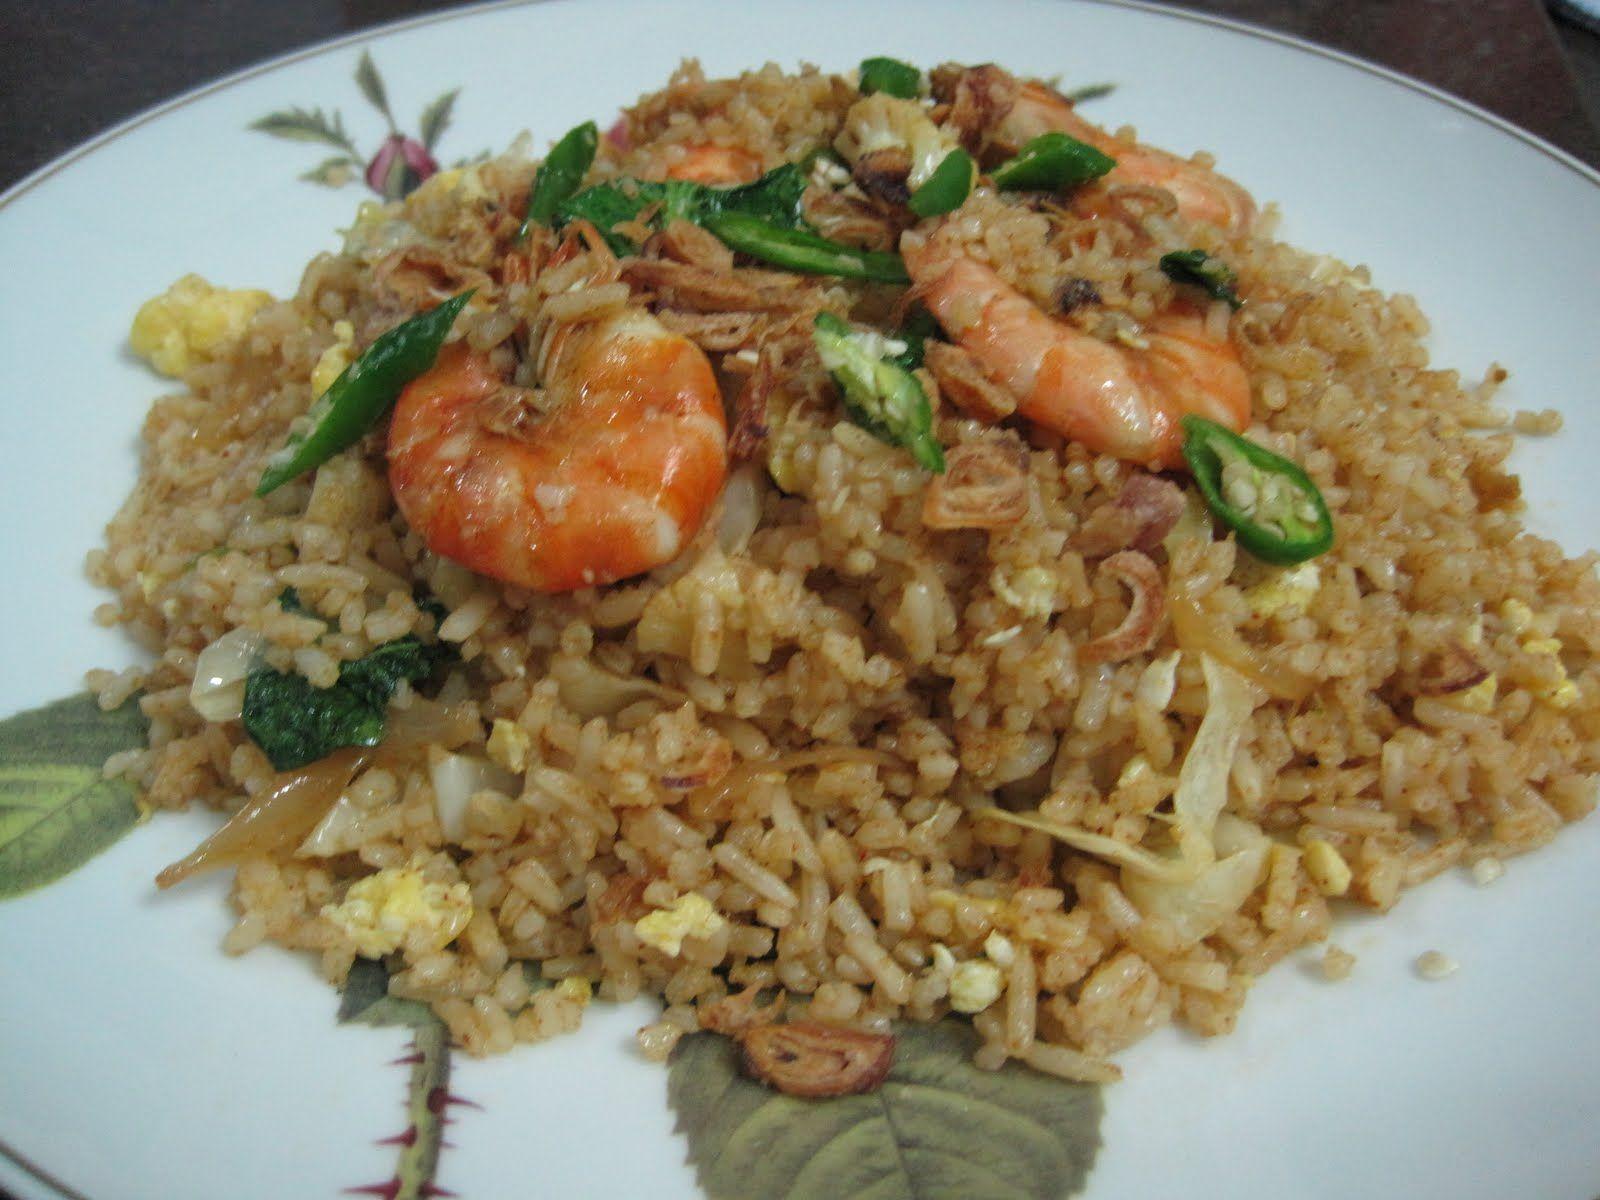 Nasi Goreng Tomyam Resepi Minggu Ini Resep Masakan Makanan Masakan Asia